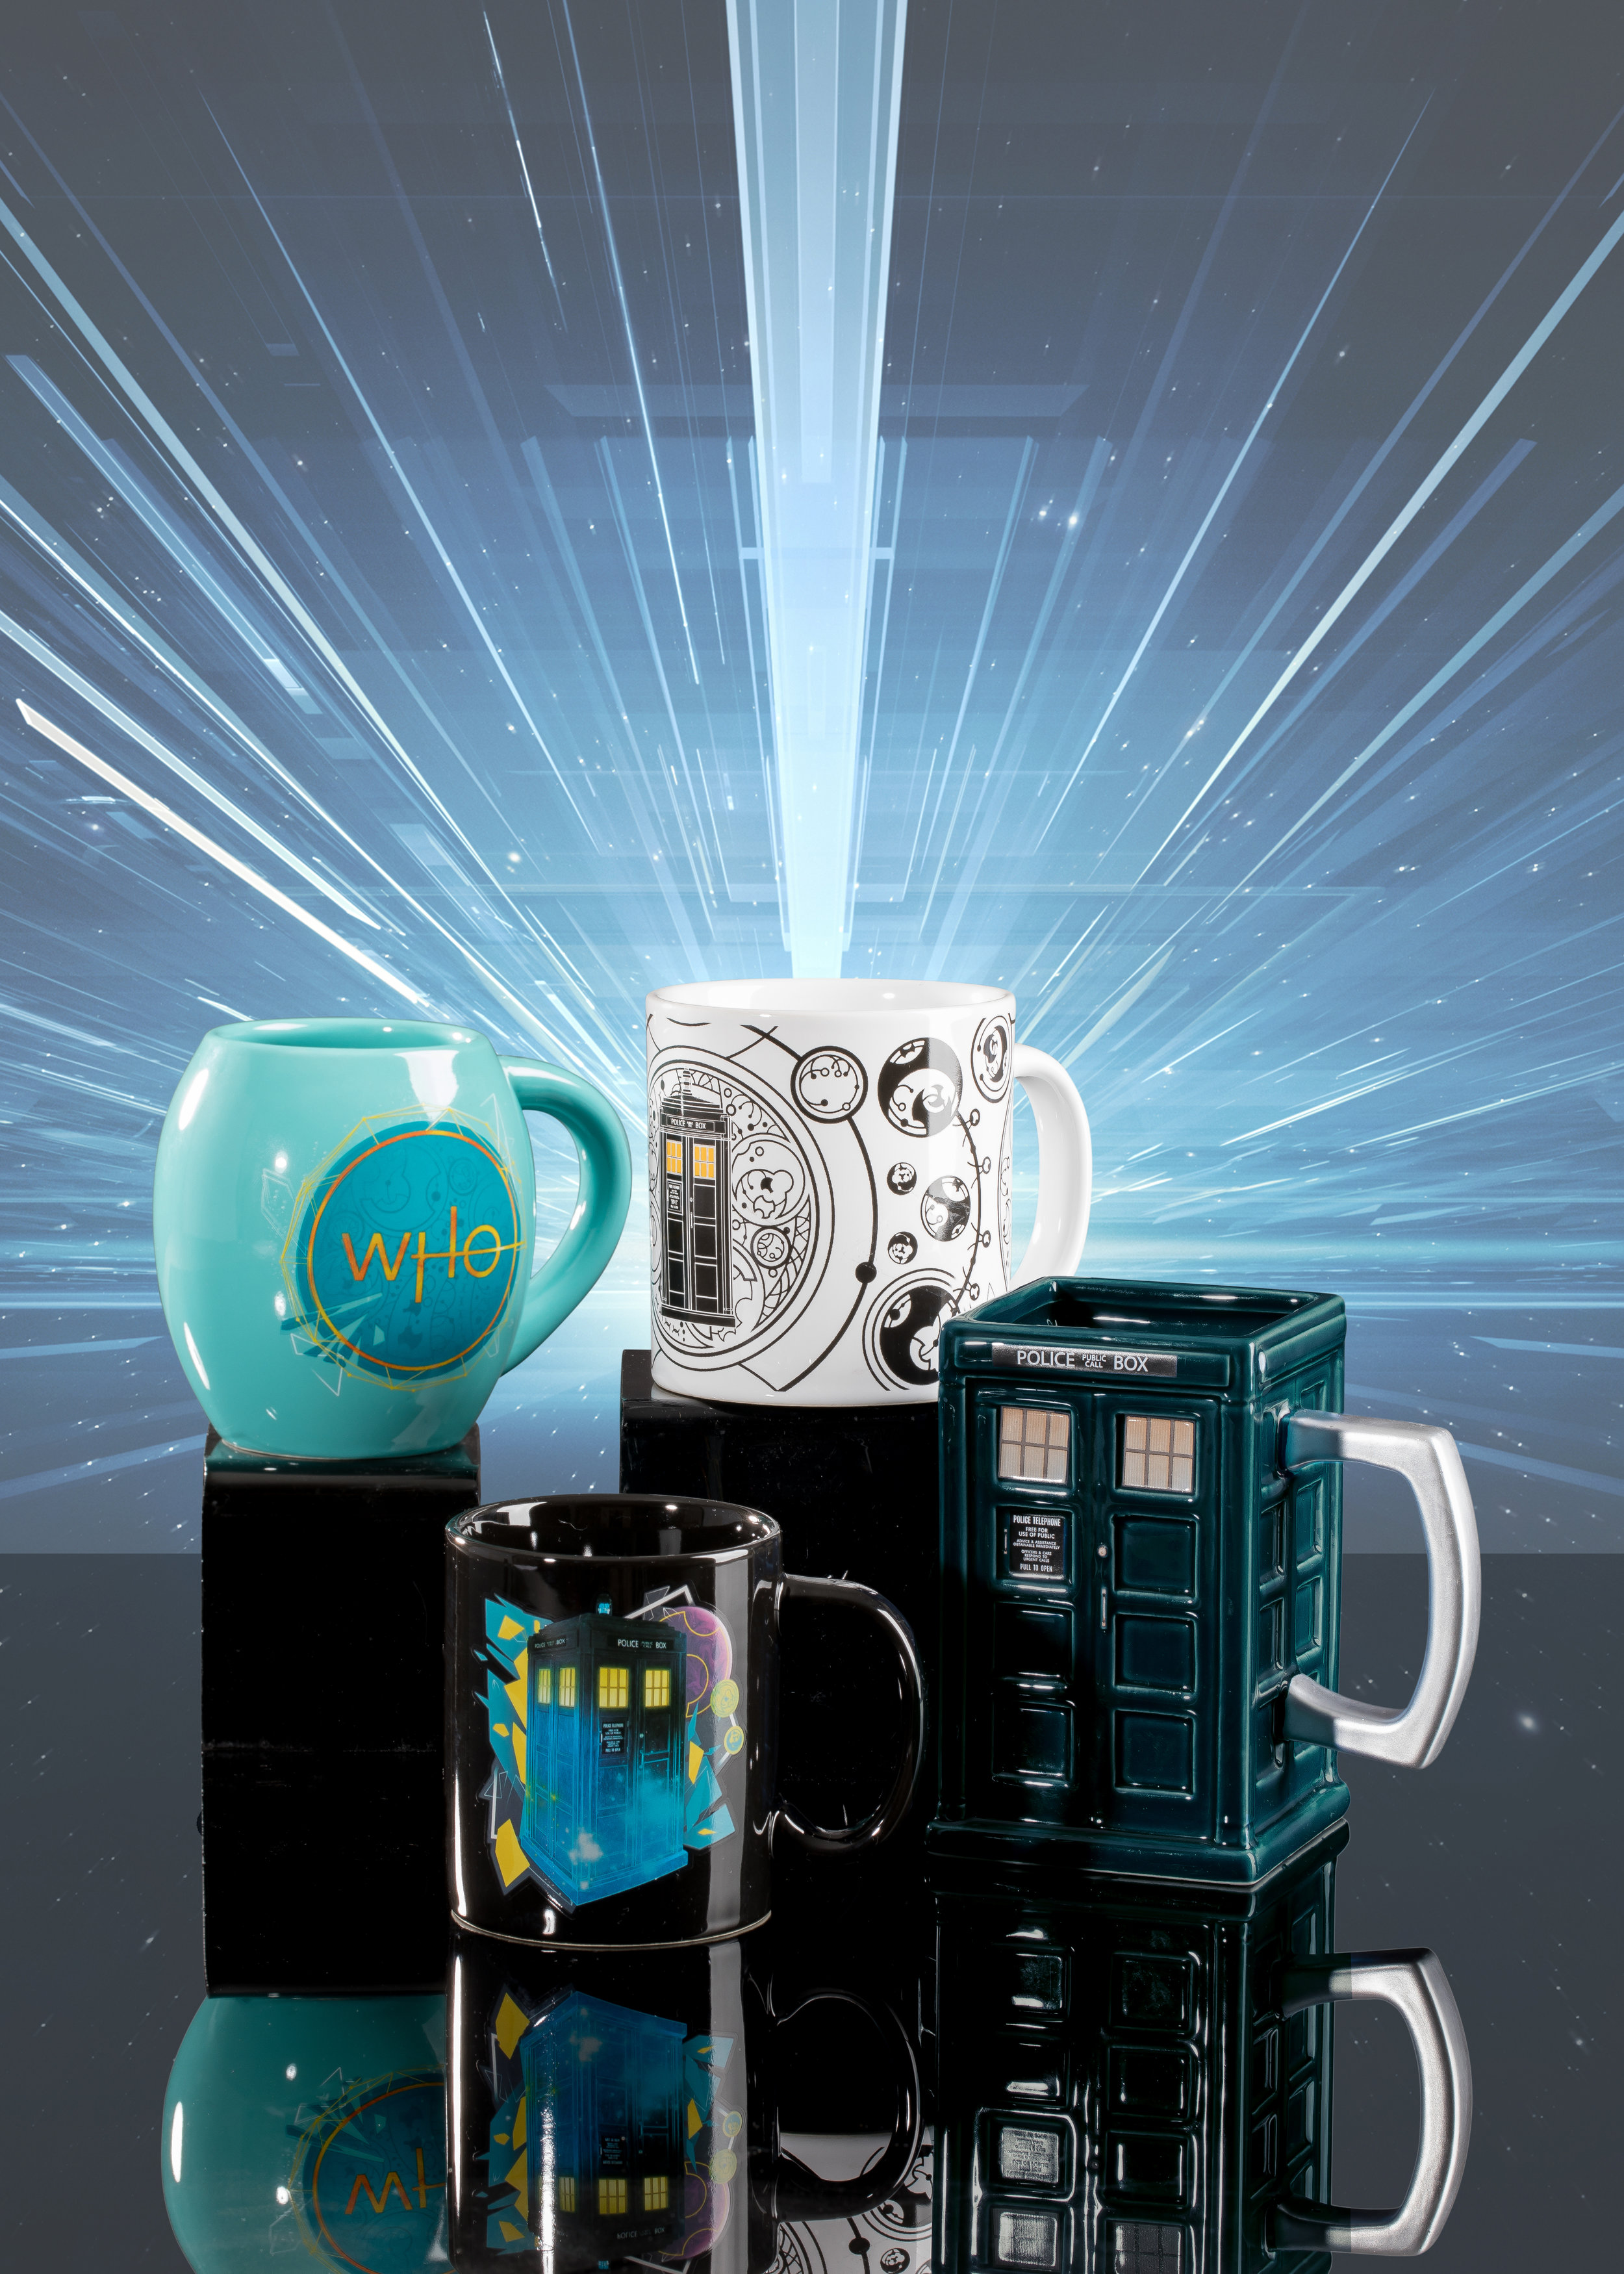 Vandor Doctor Who_EDITED Original File_PORTRAIT_2.jpg